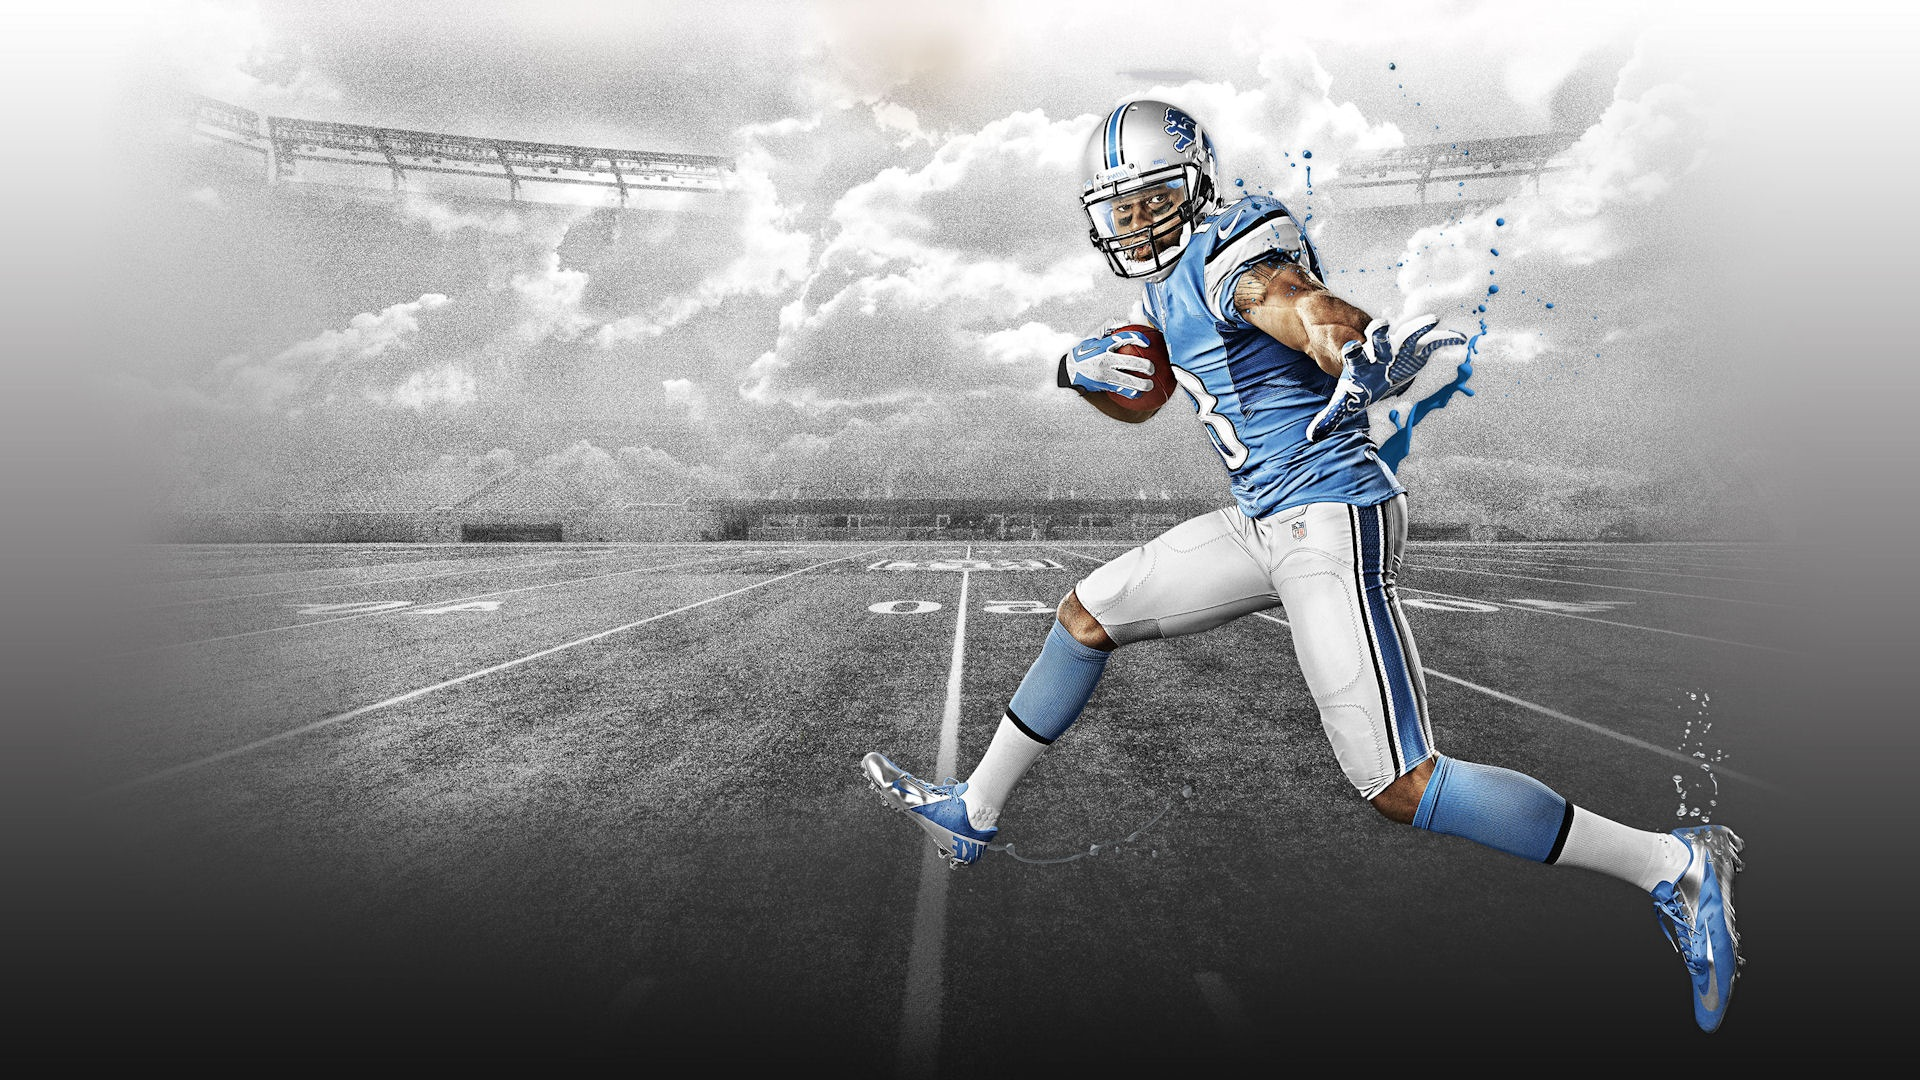 Free Download Wallpaper Football: American Football HD Wallpapers